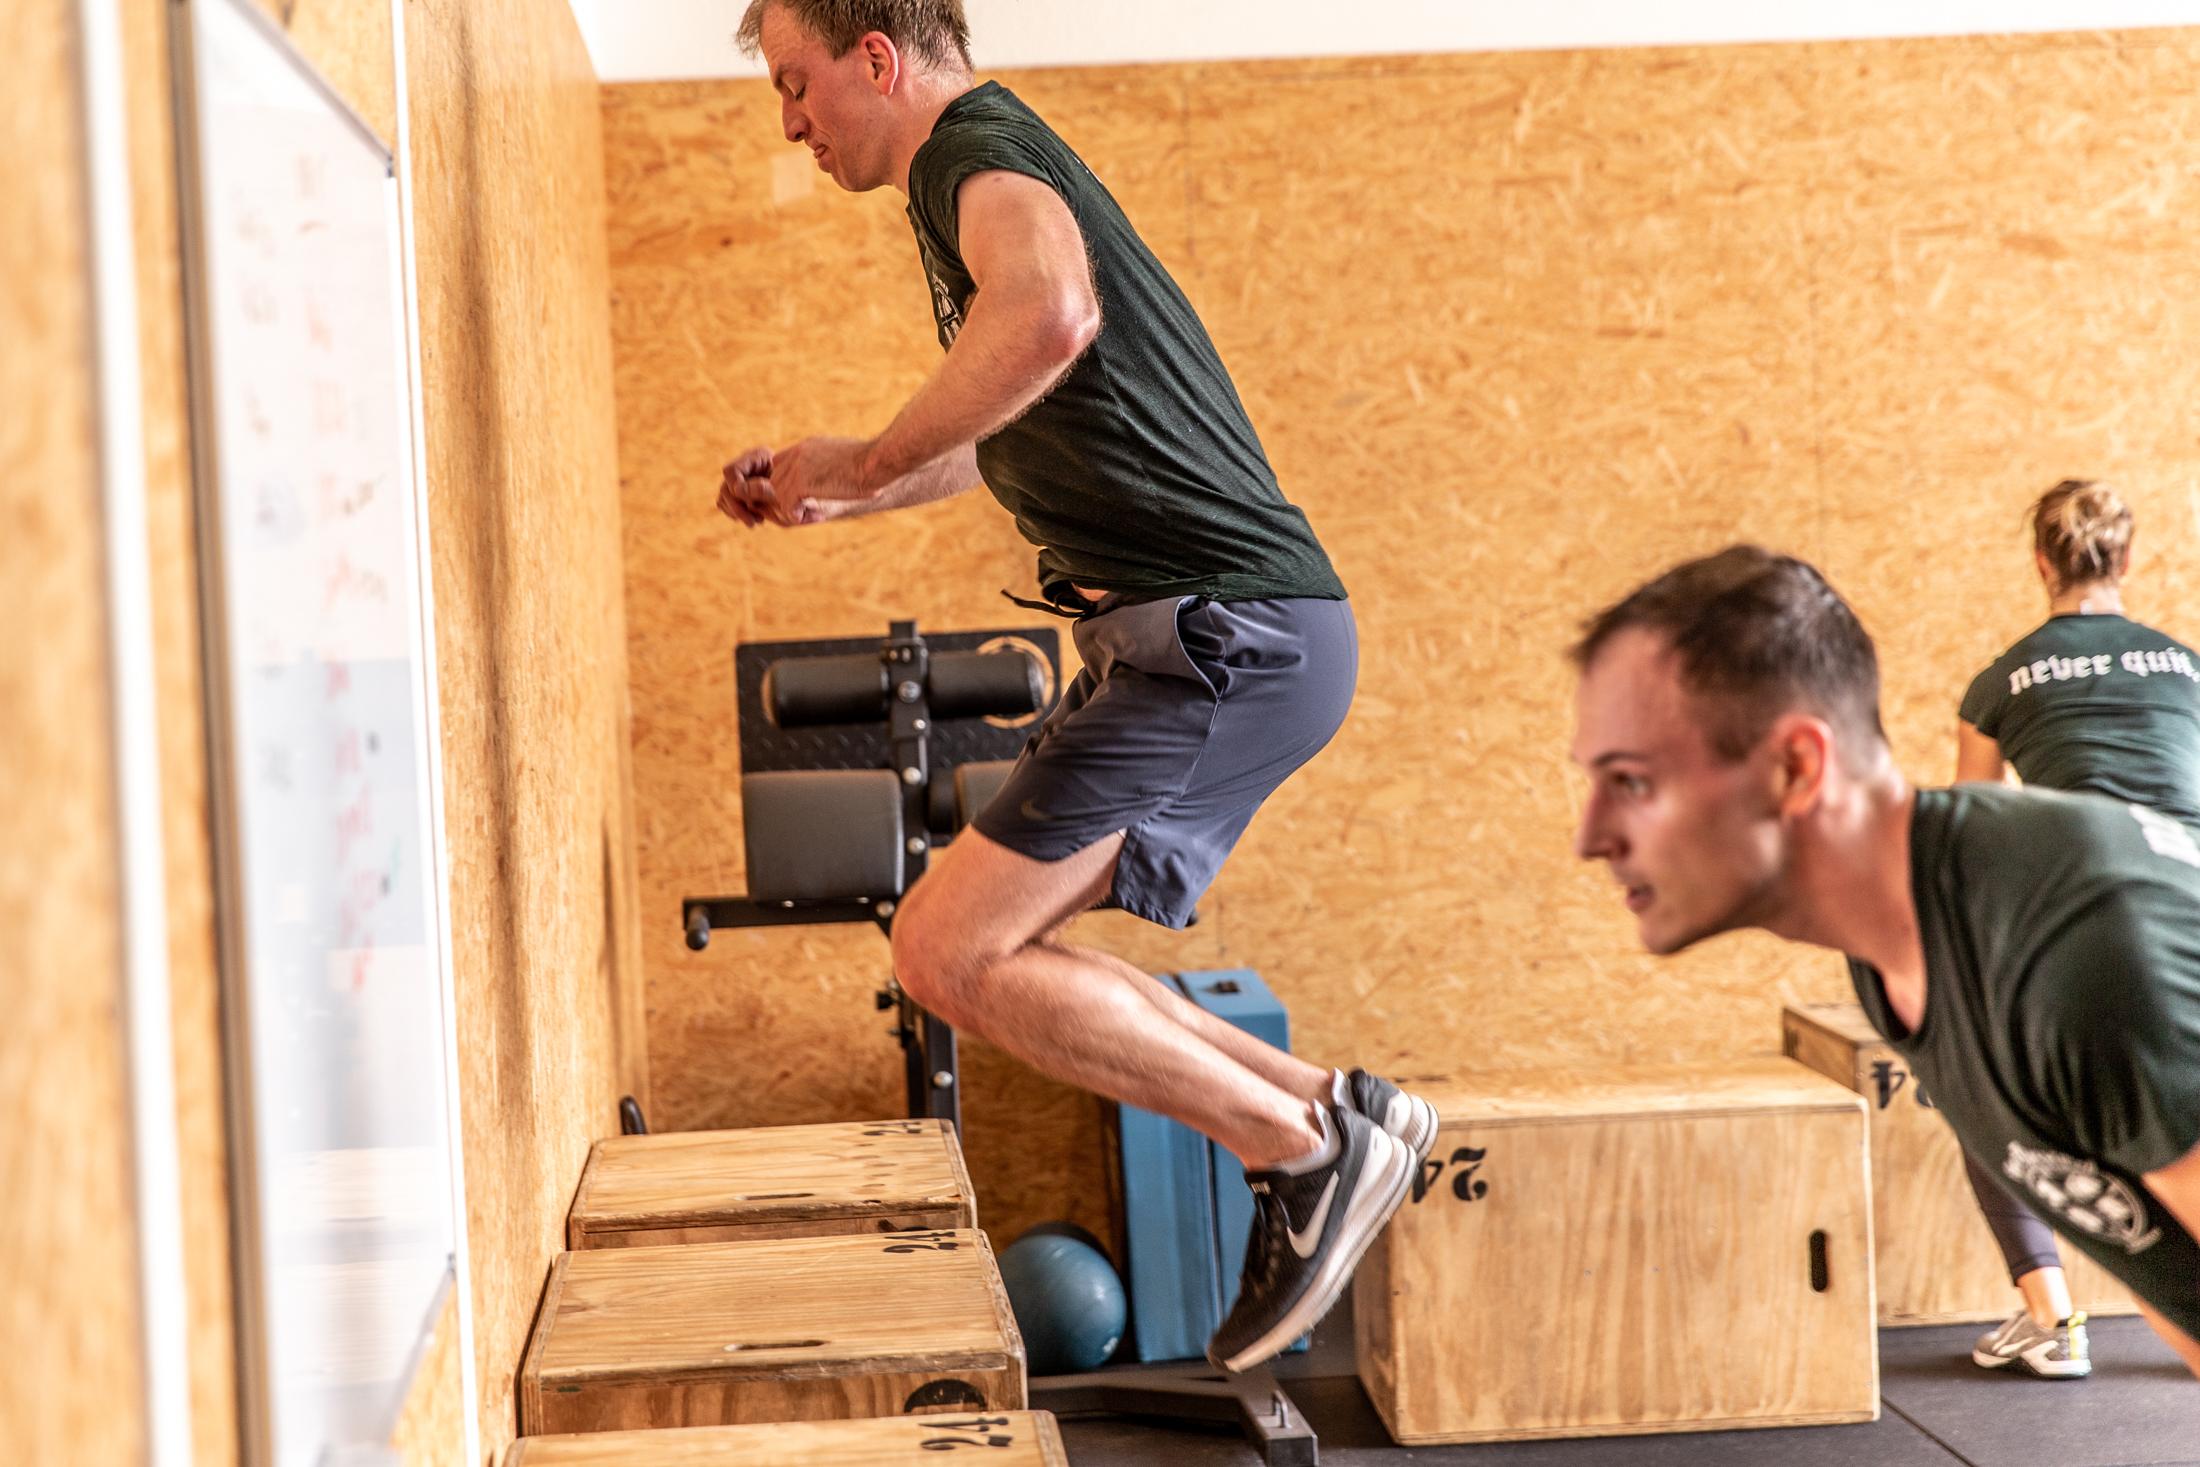 CrossFit Four Horsemen Box Jump Fit